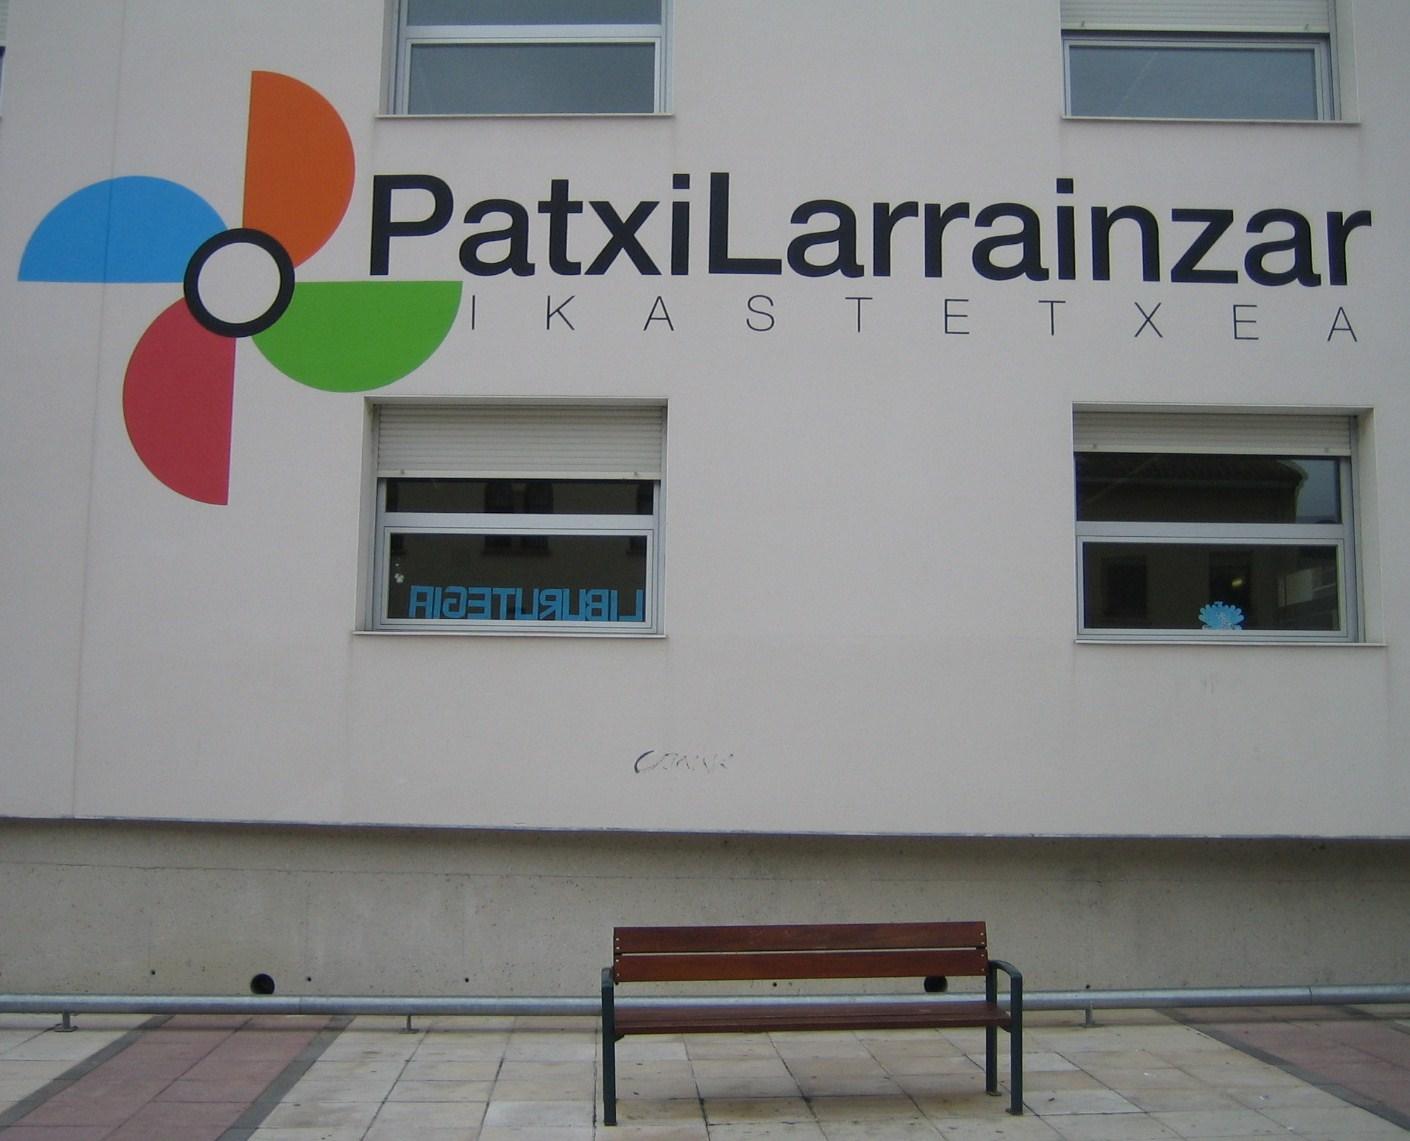 Ruego; Patxi Larrainzar